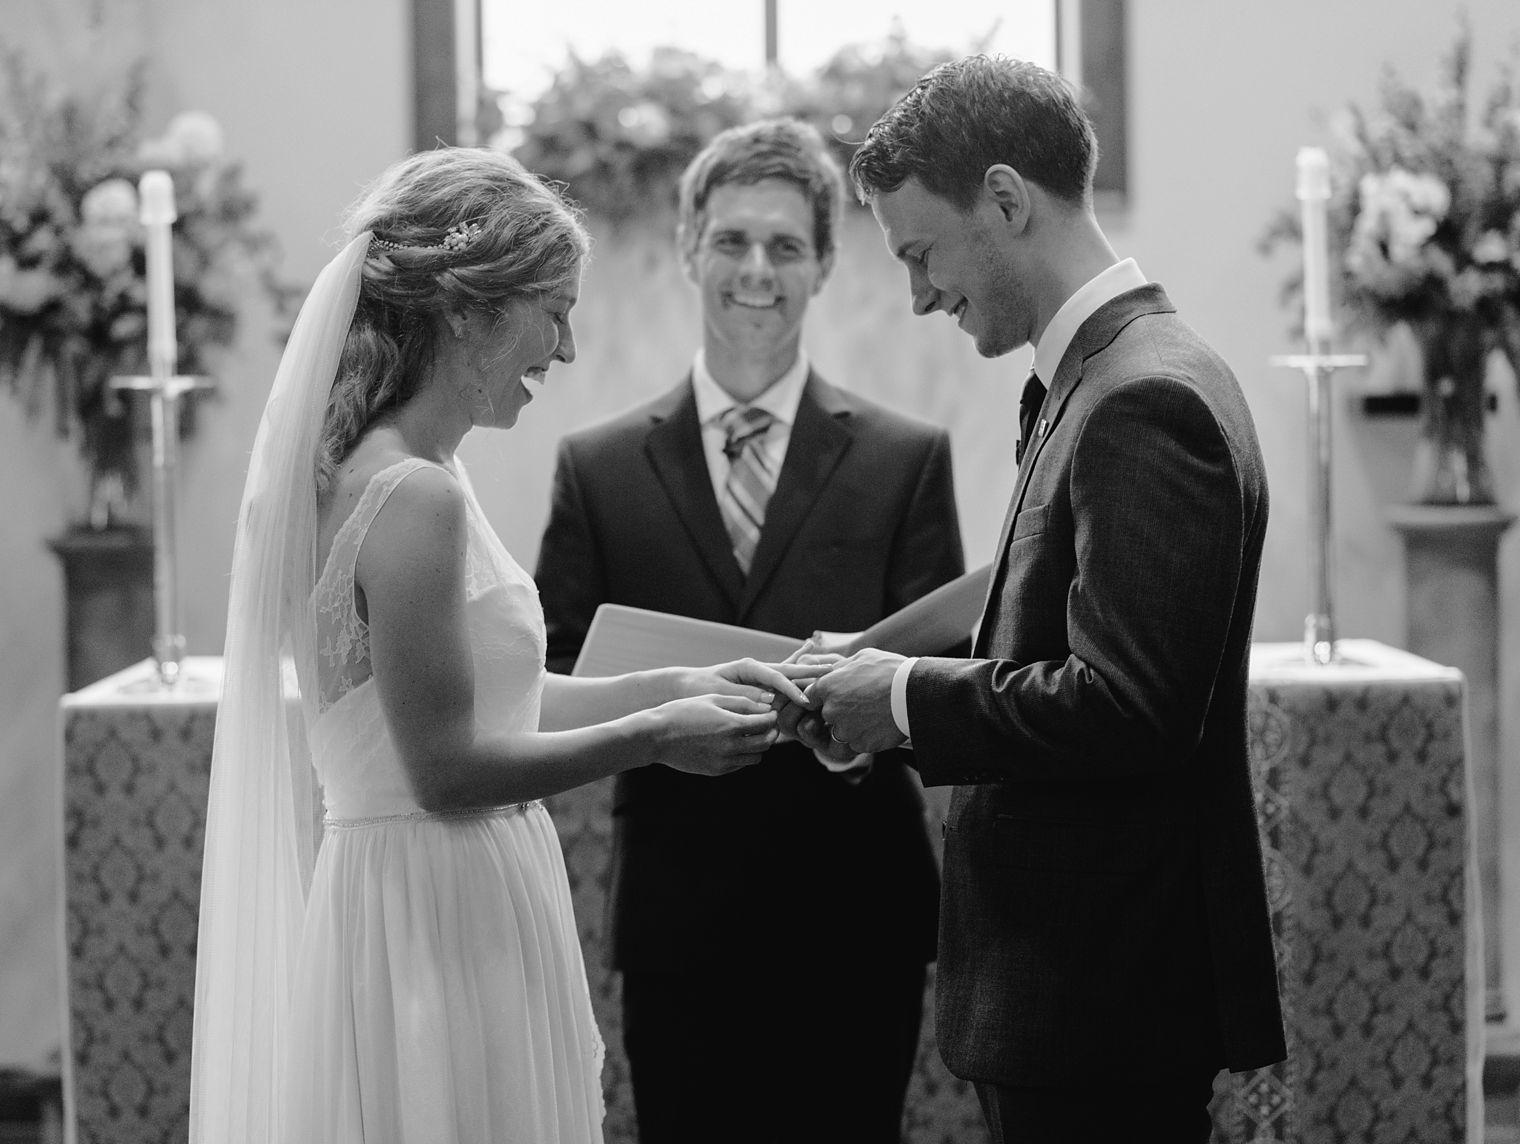 wedding ceremony in Occonomowoc